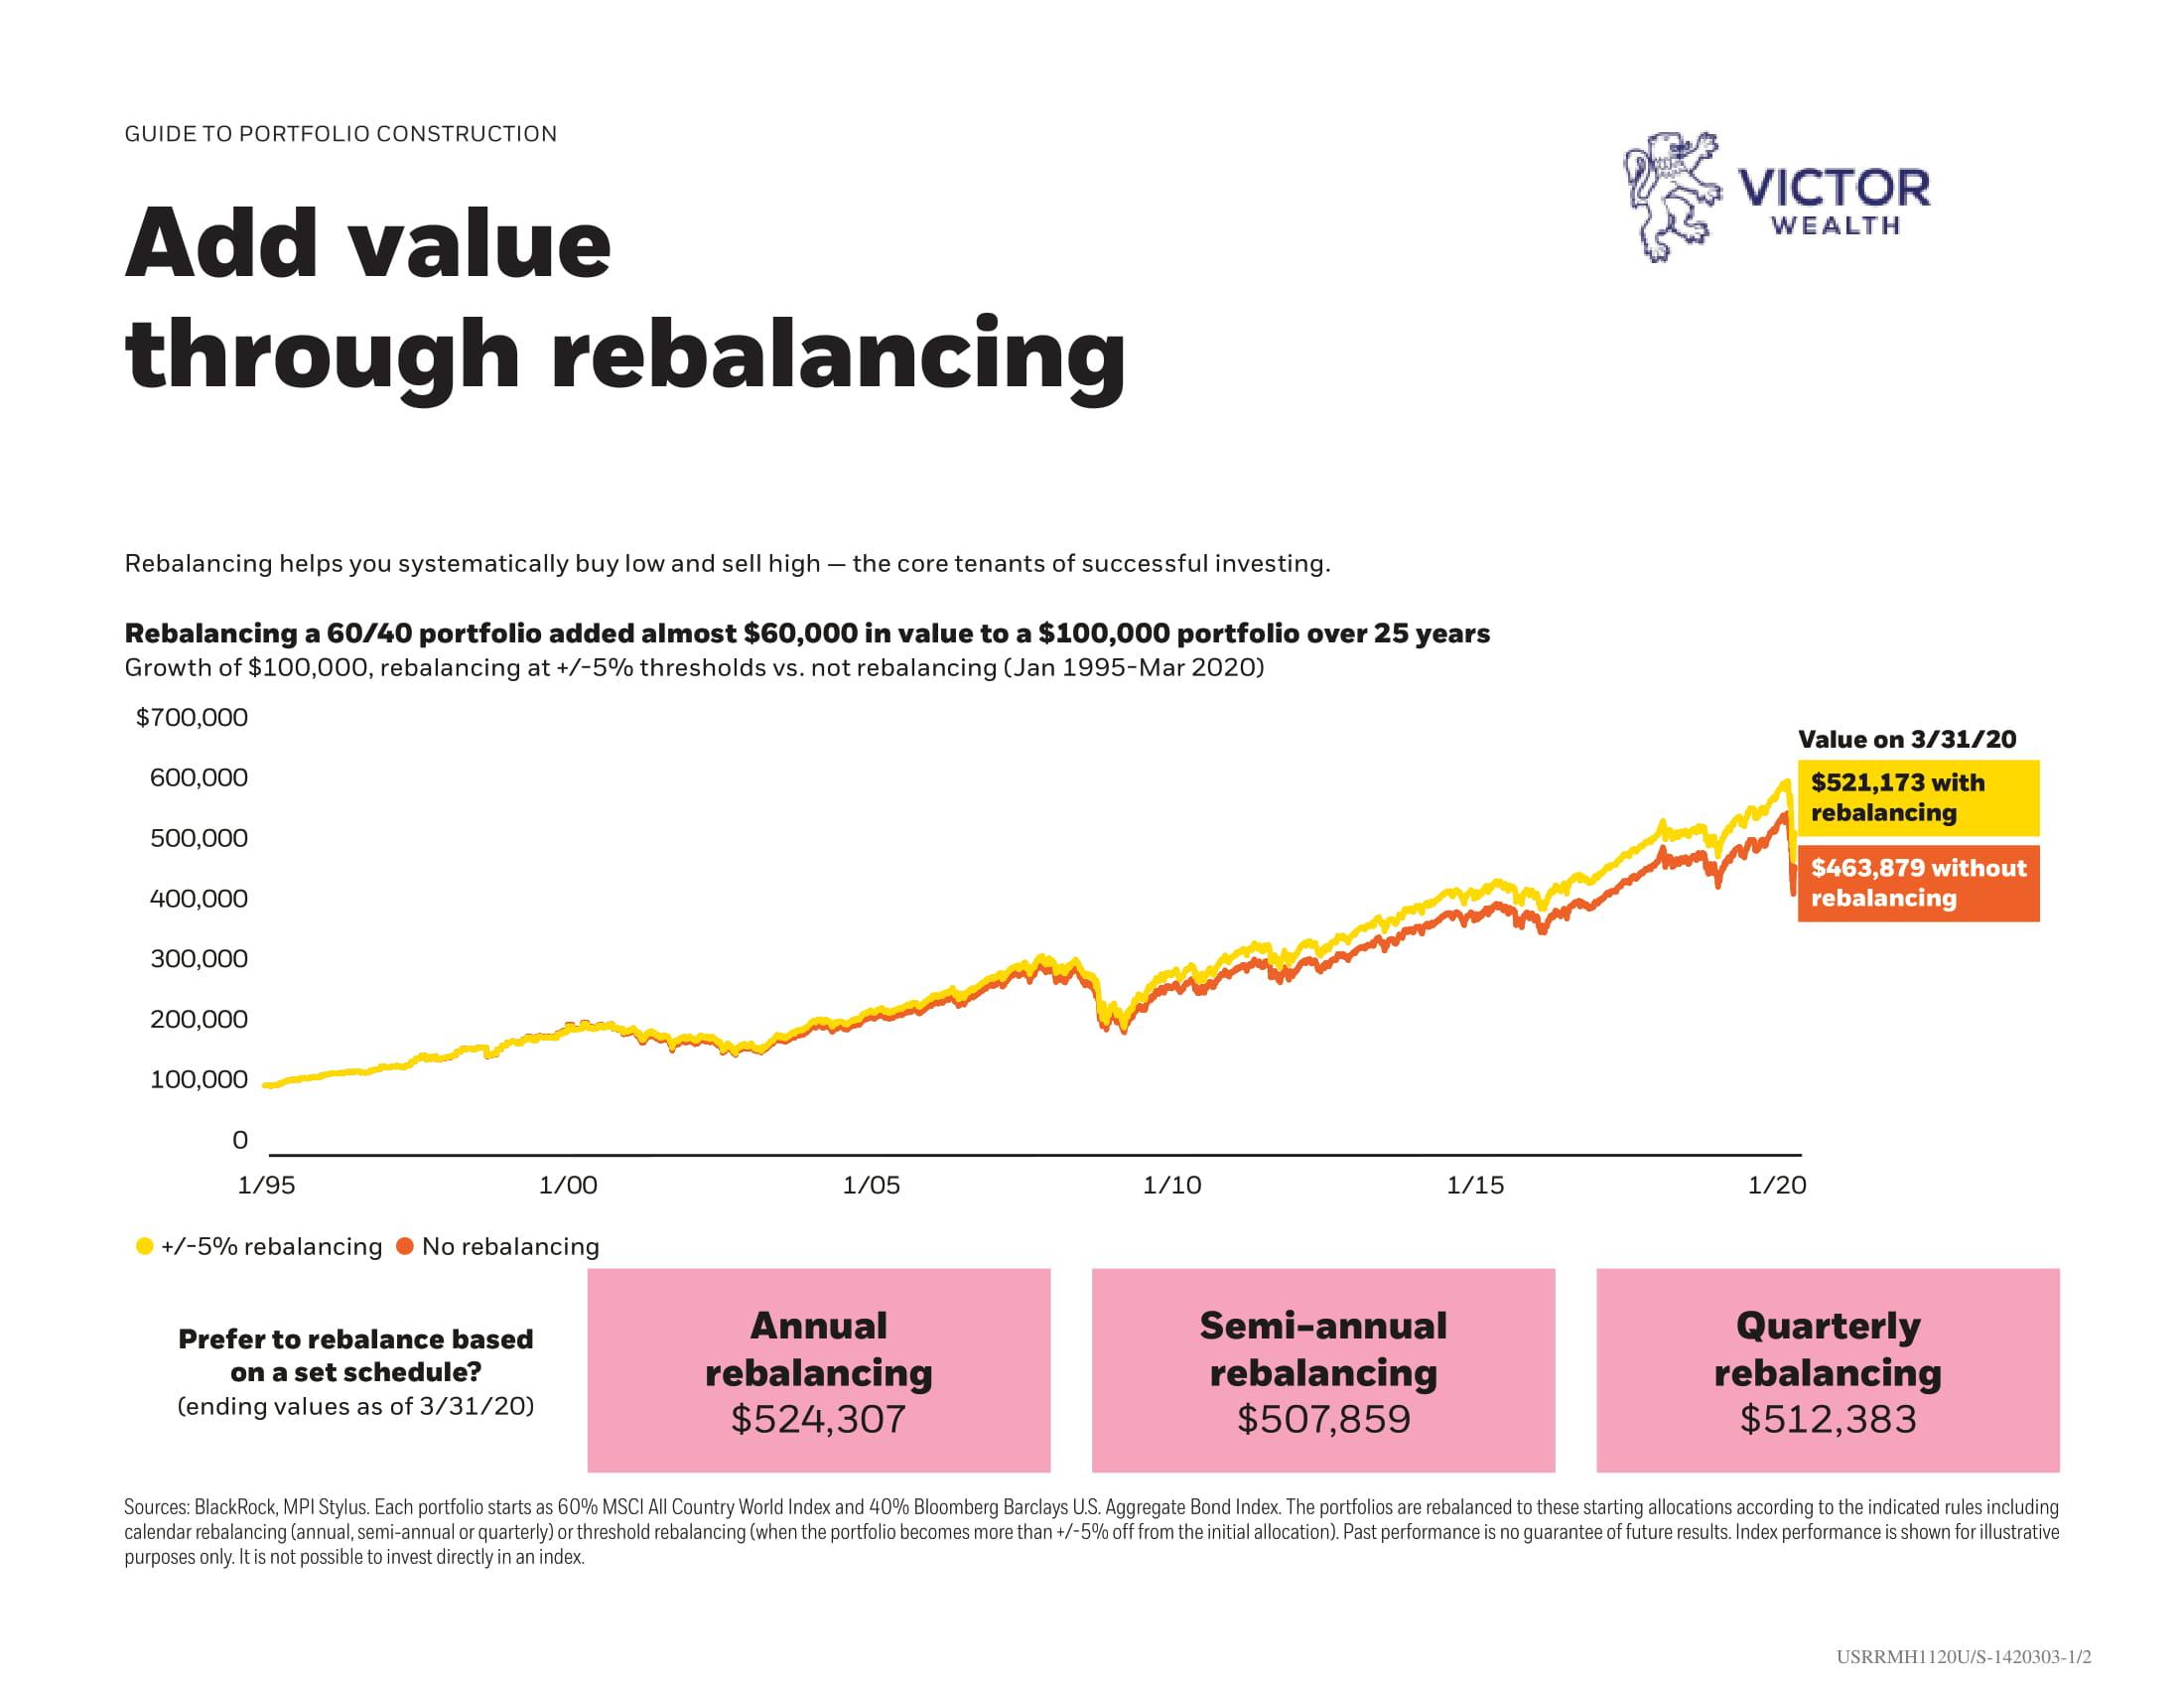 Add Value Through Rebalancing Chart